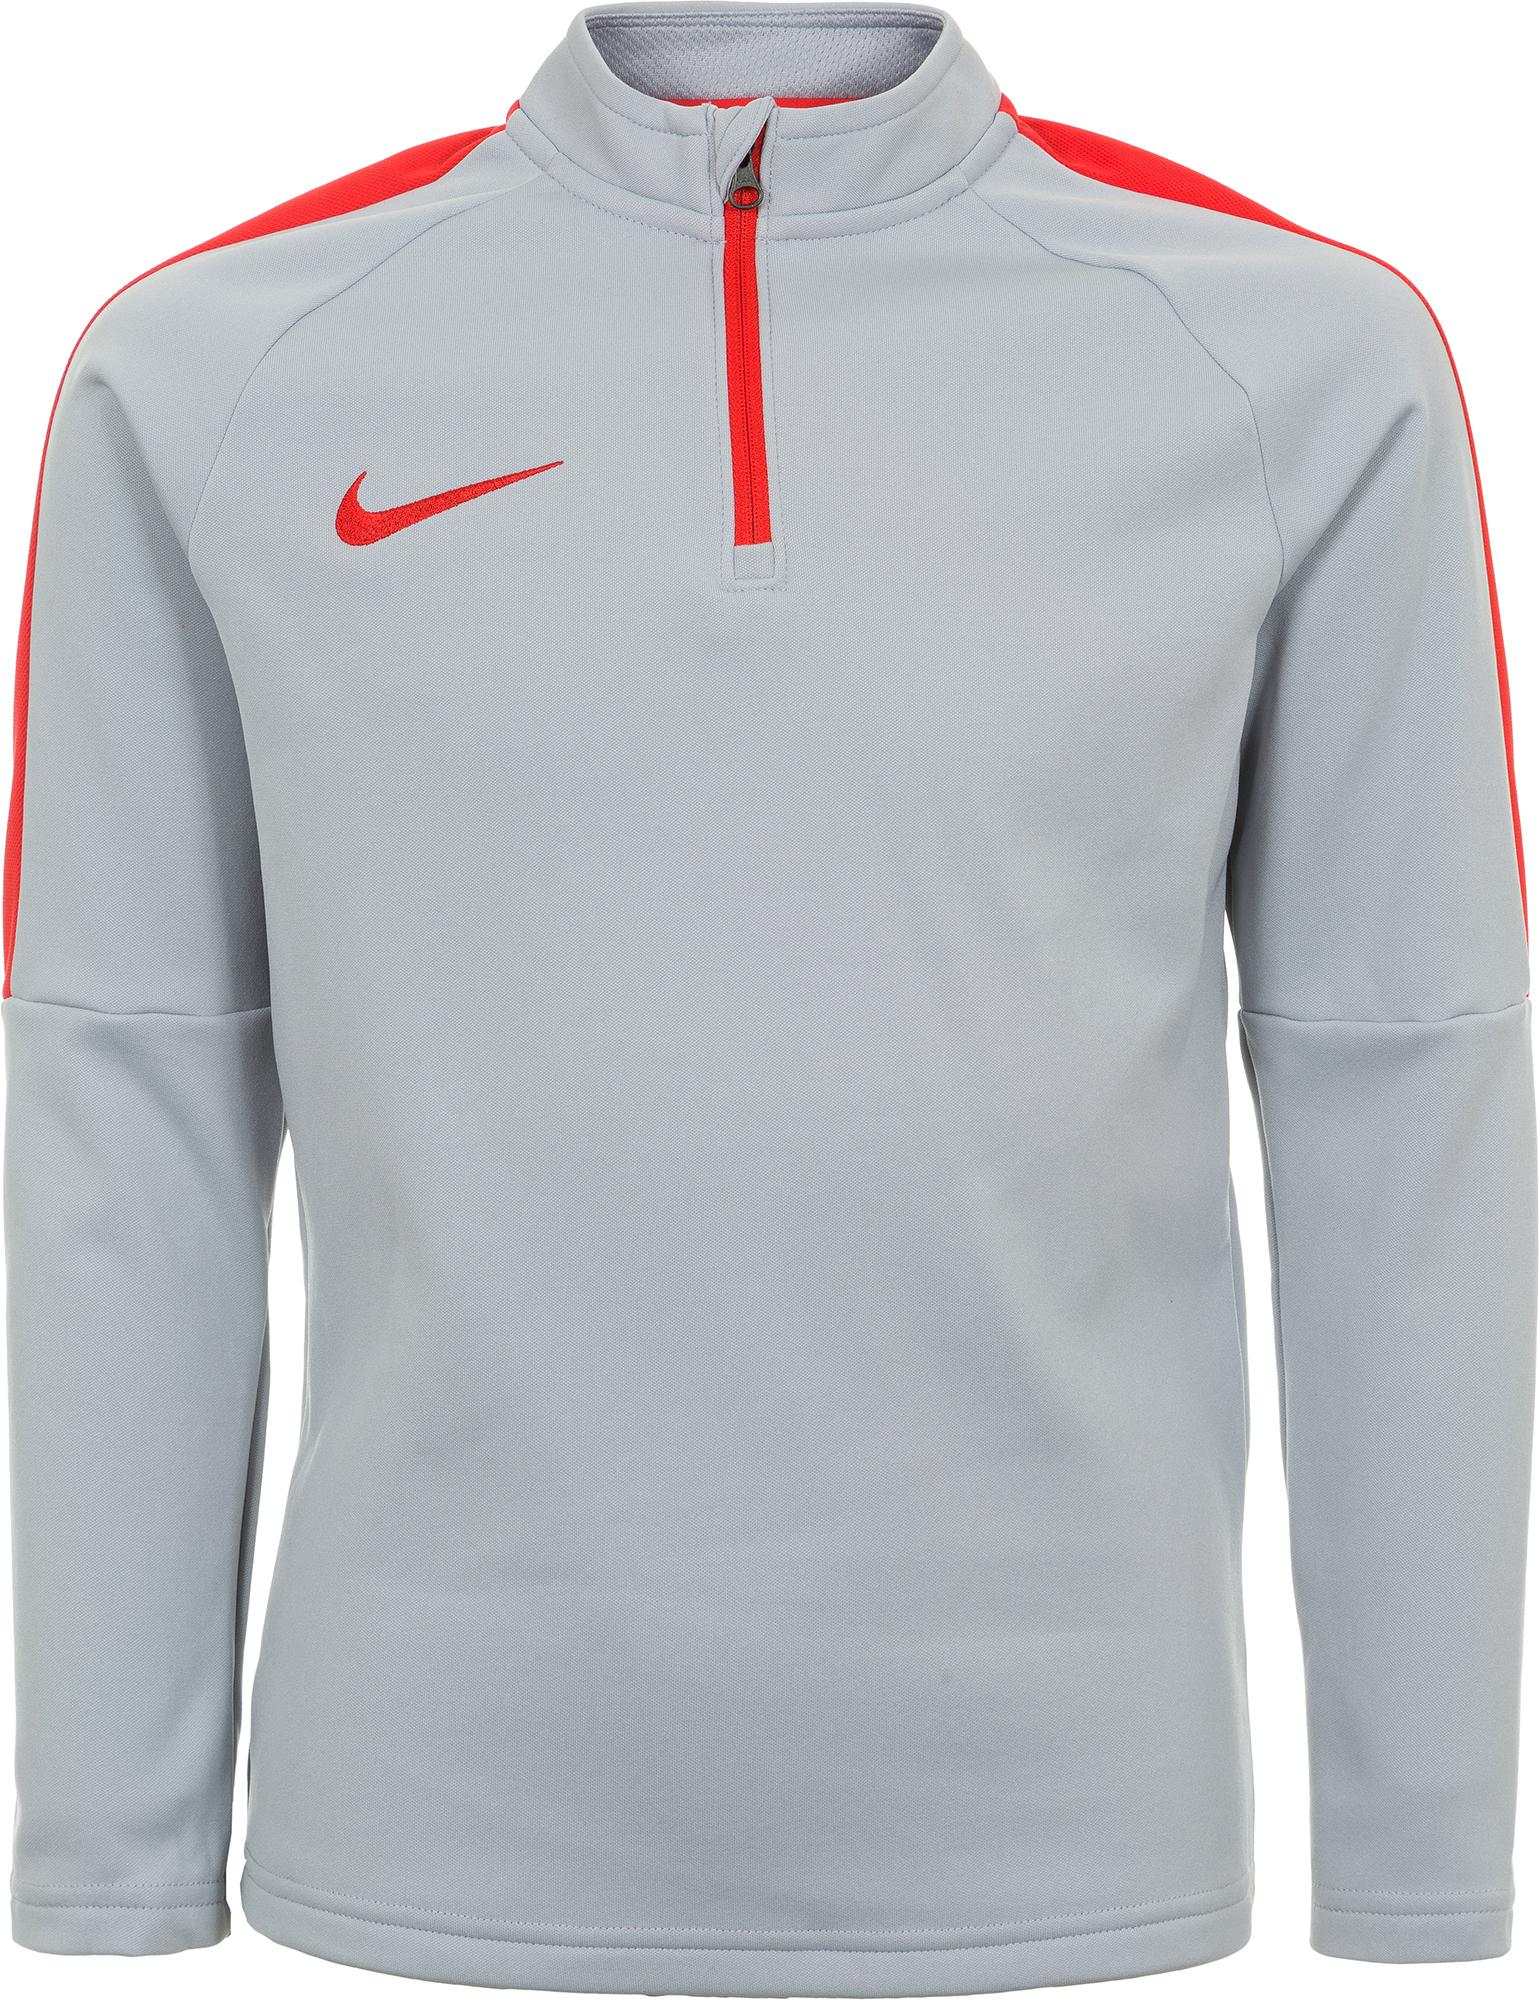 Nike Джемпер для мальчиков Nike Dry, размер 52-54